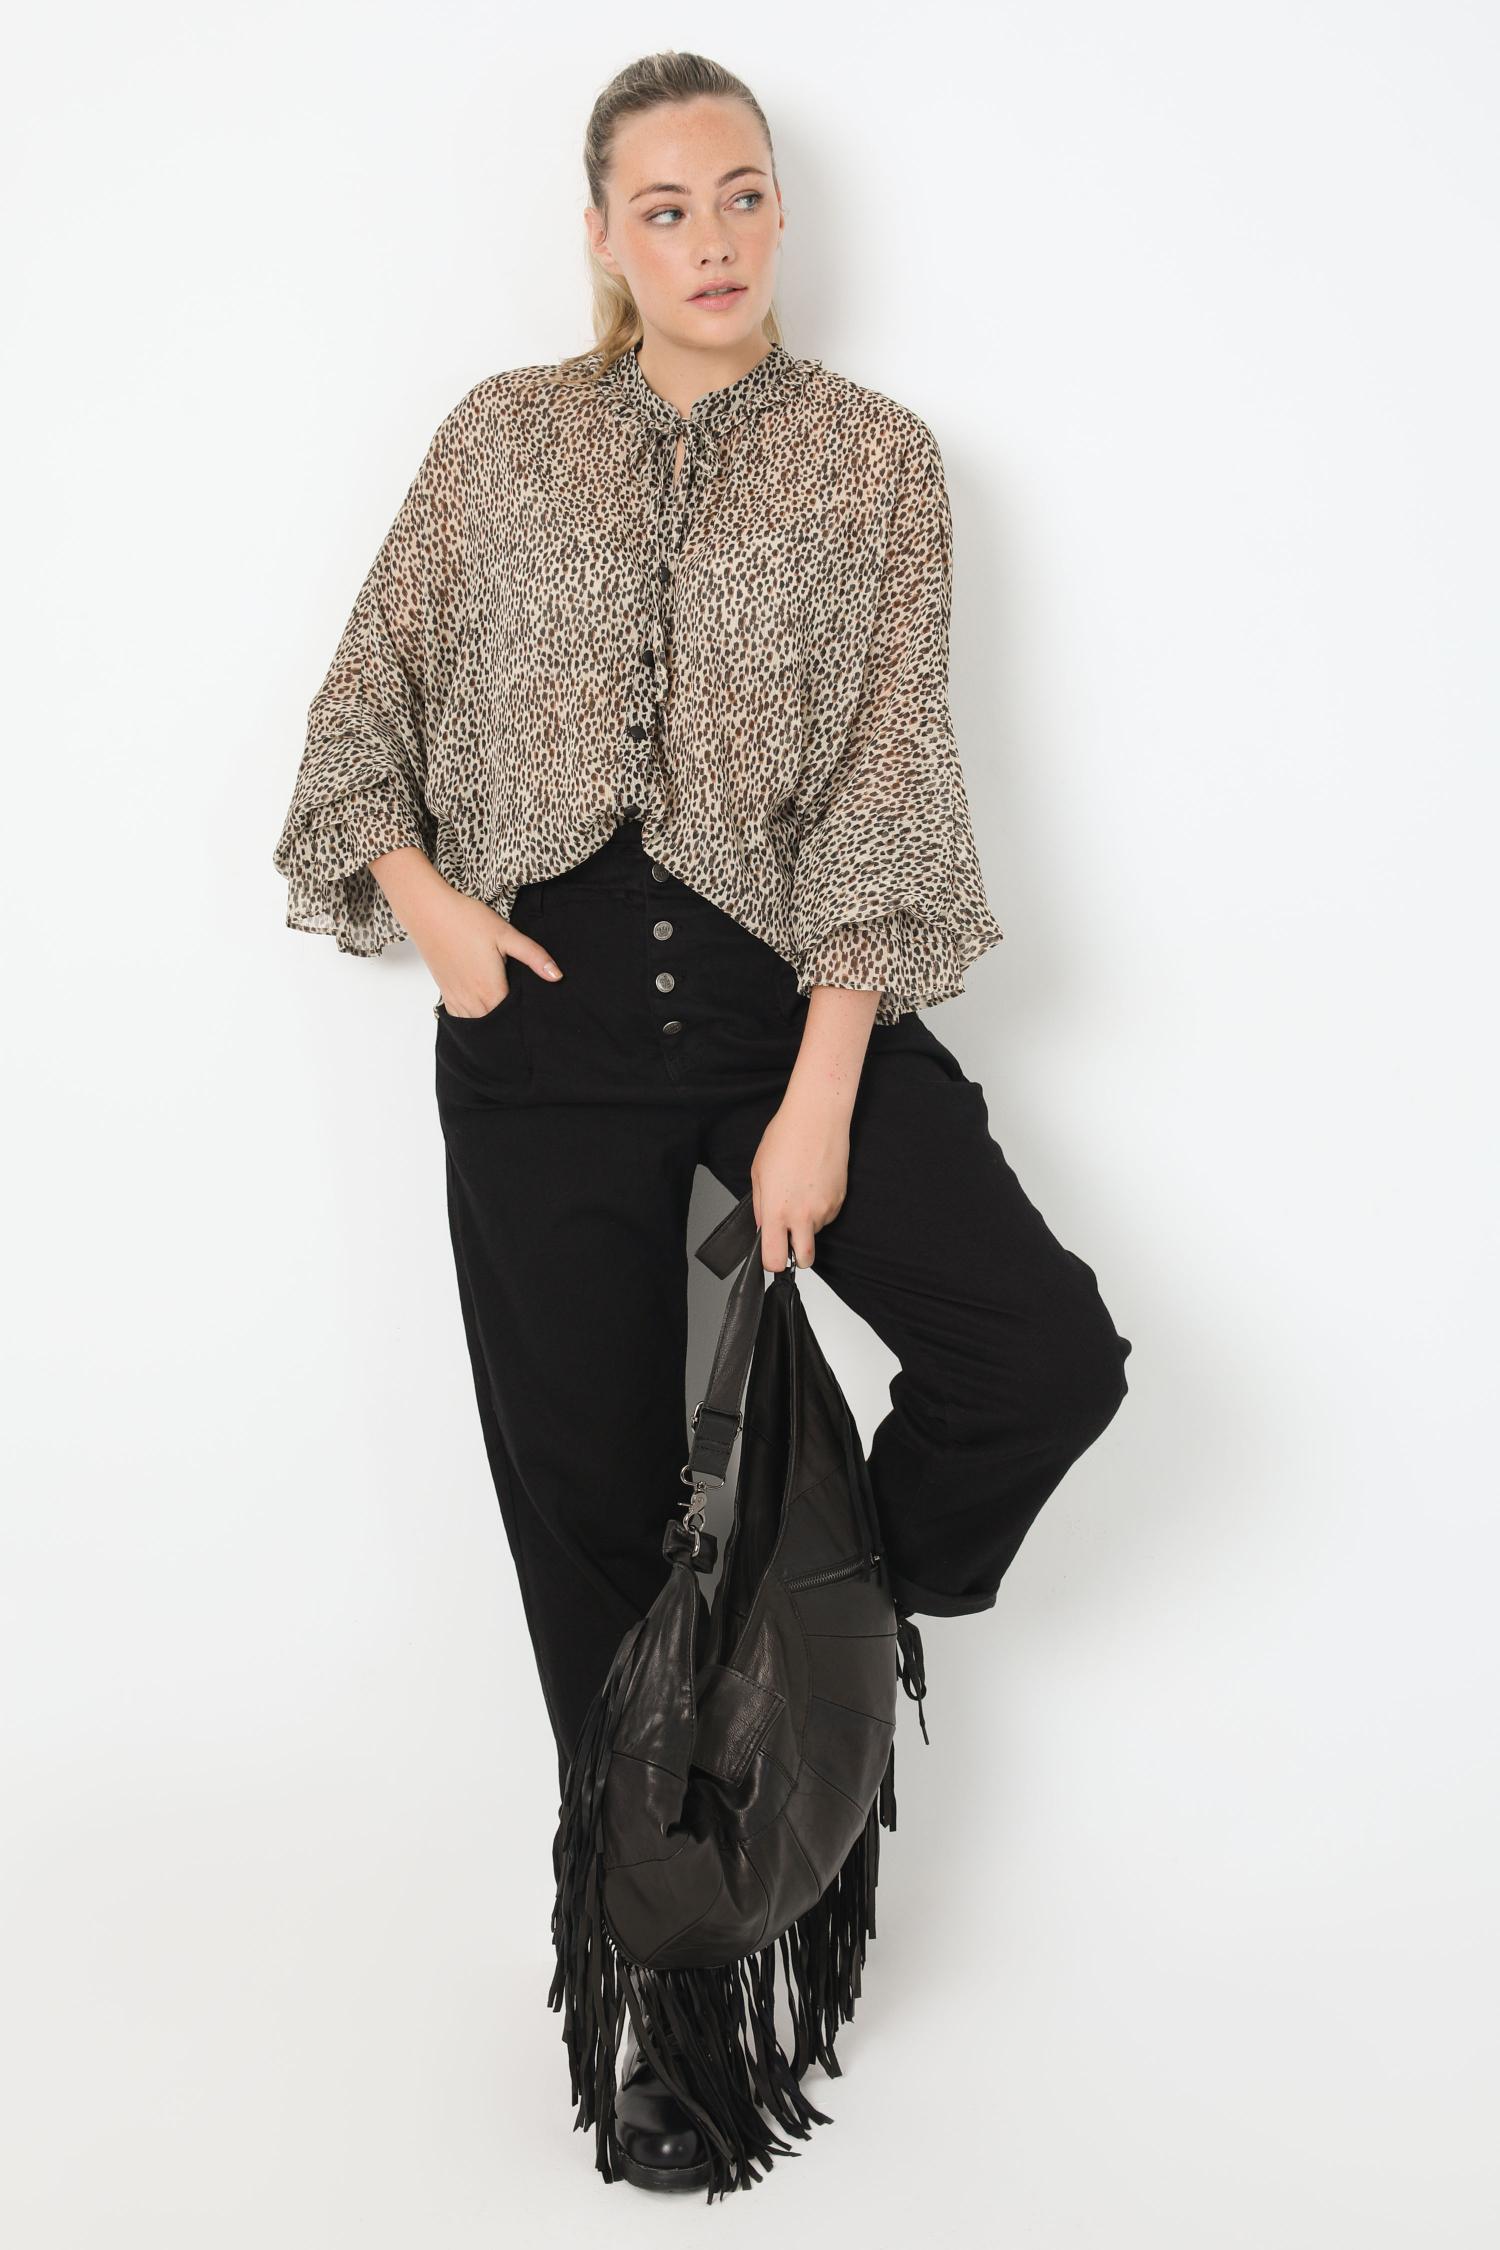 Mandarin collar shirt in printed veil with oeko-tex fabric (shipping October 15/20)